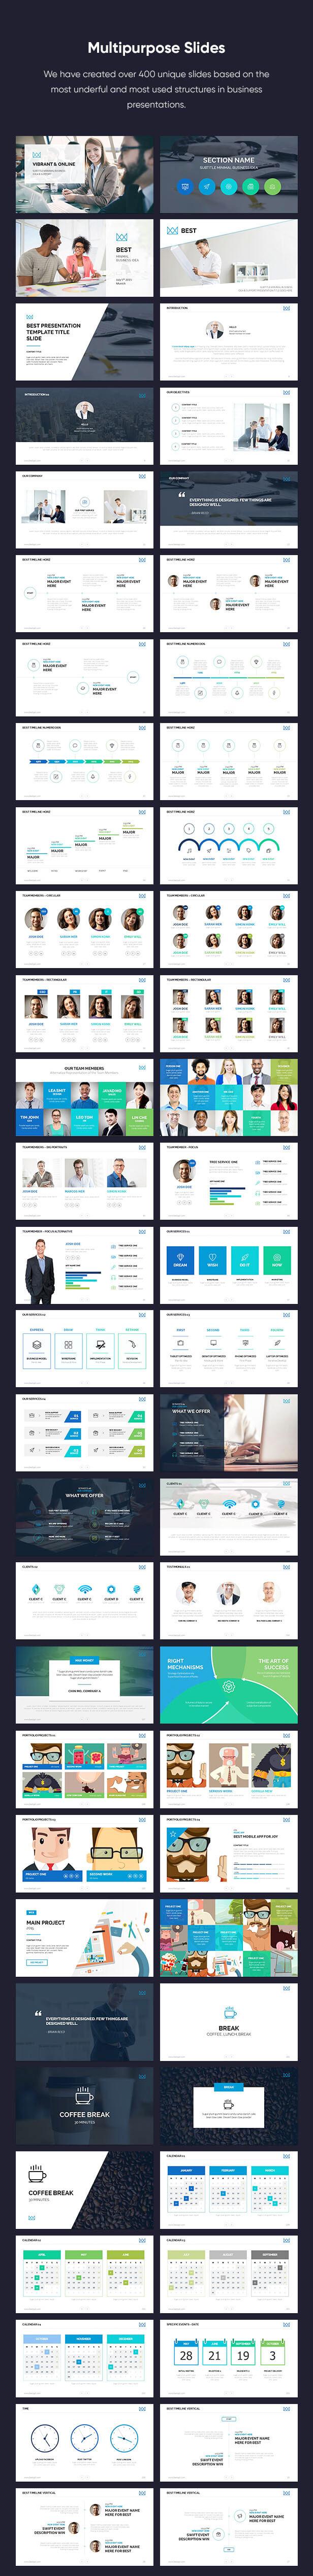 Business Keynote Presentation Template - 5